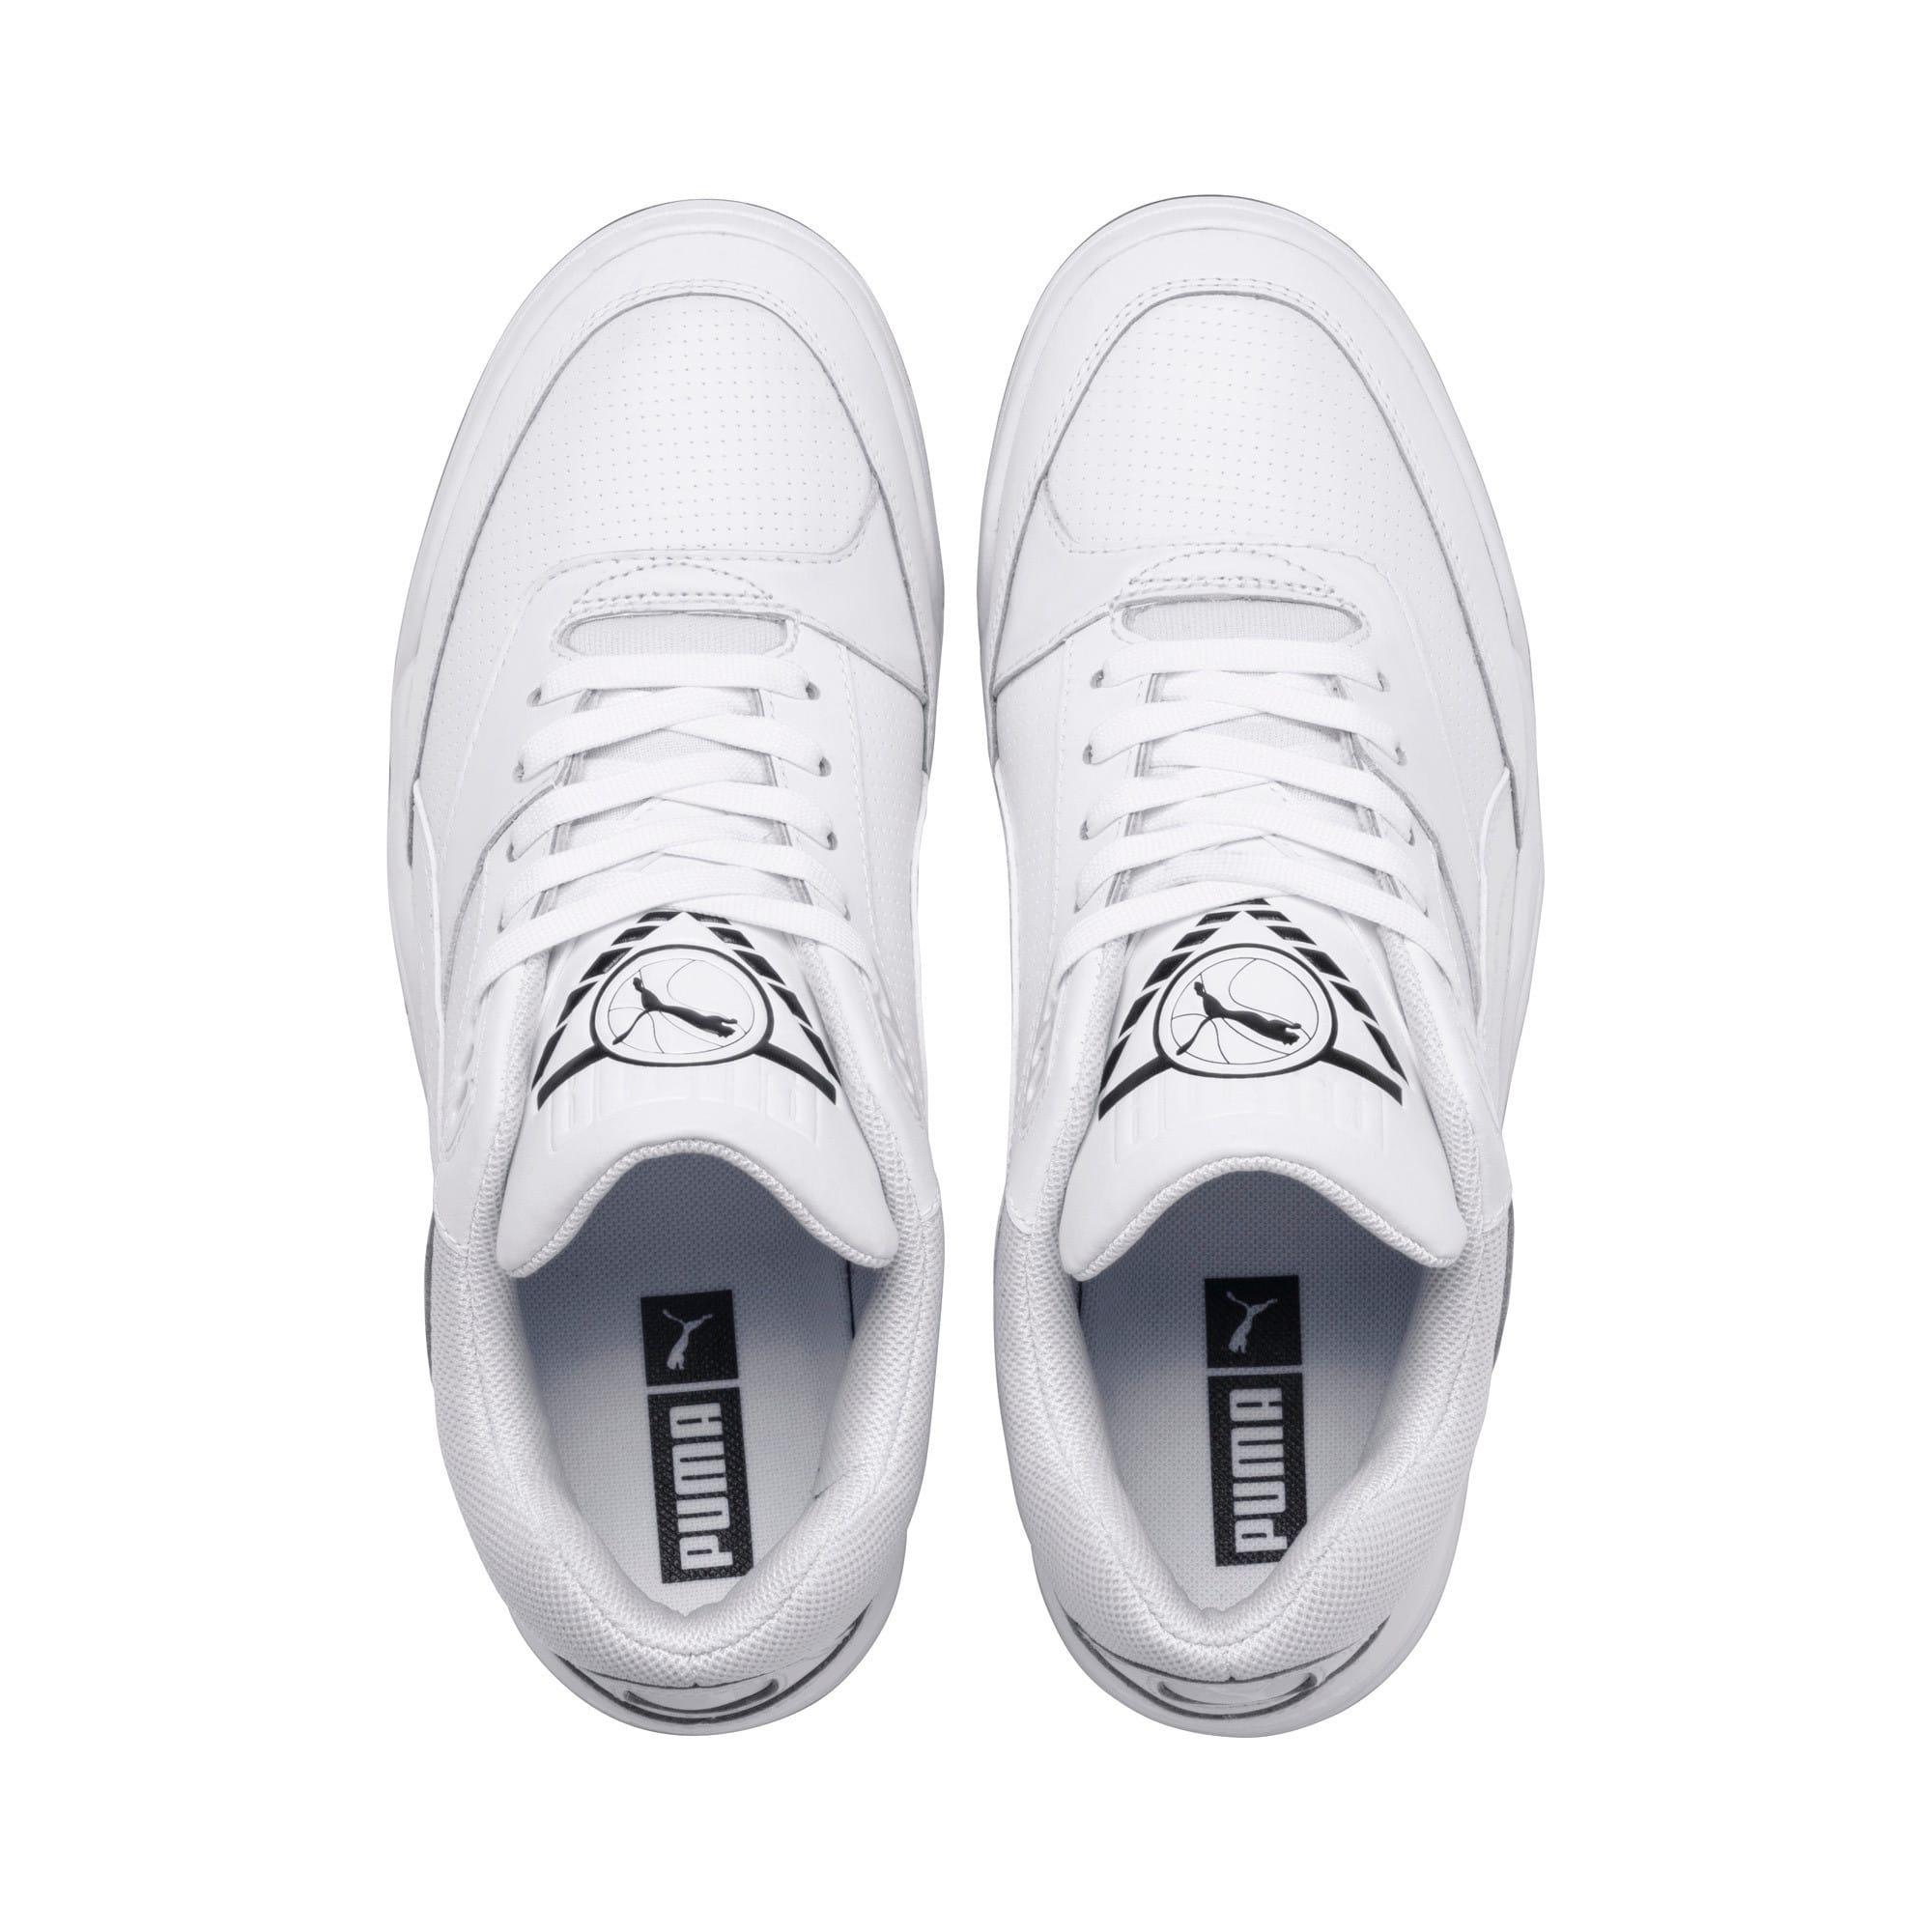 Thumbnail 6 of Palace Guard Sneakers, Puma White-Puma White-Gum, medium